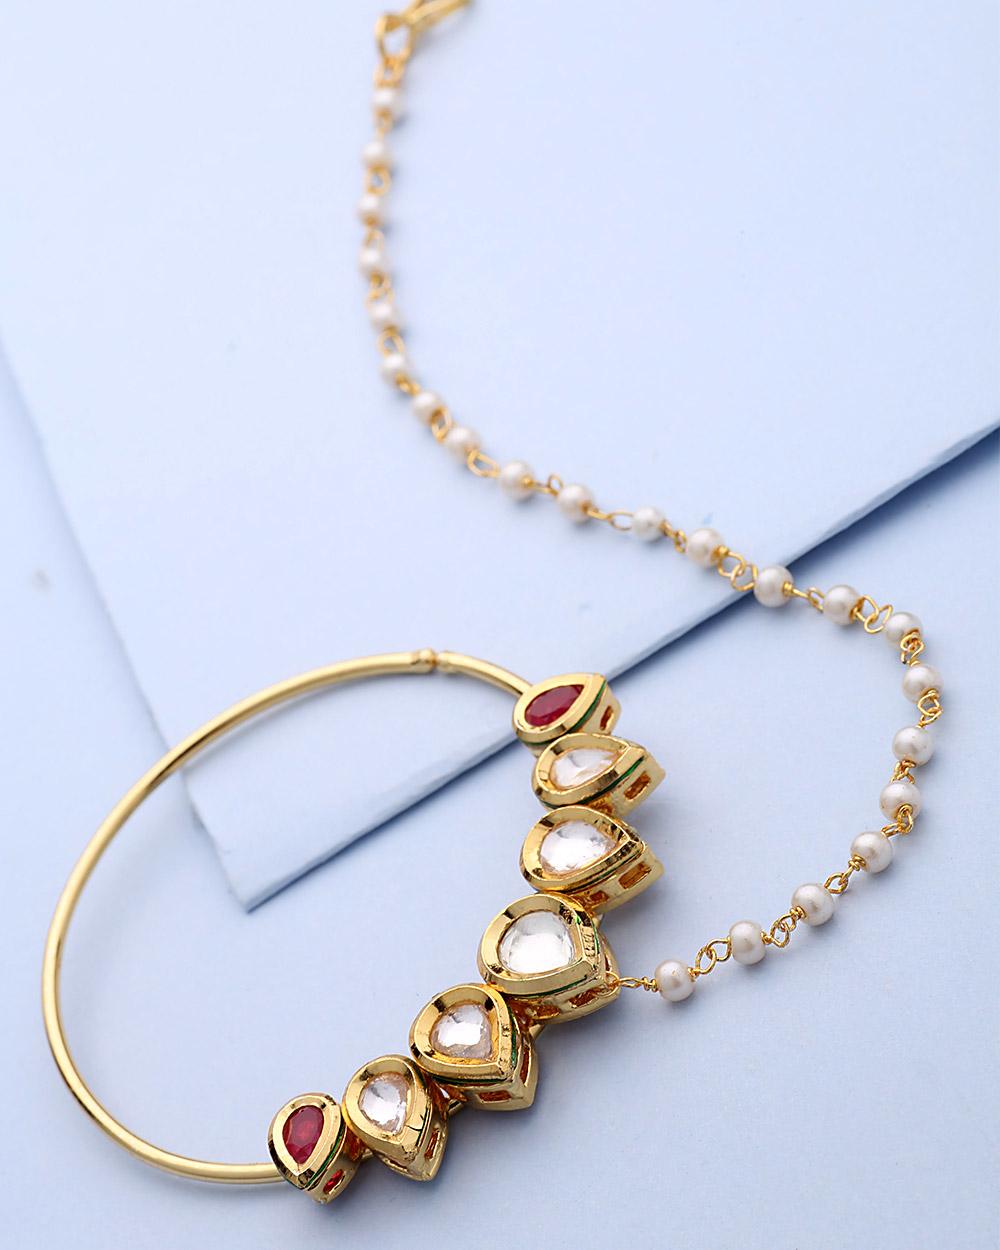 Buy Lovely Nose Ring With Kundan Embellishment Online India | Voylla